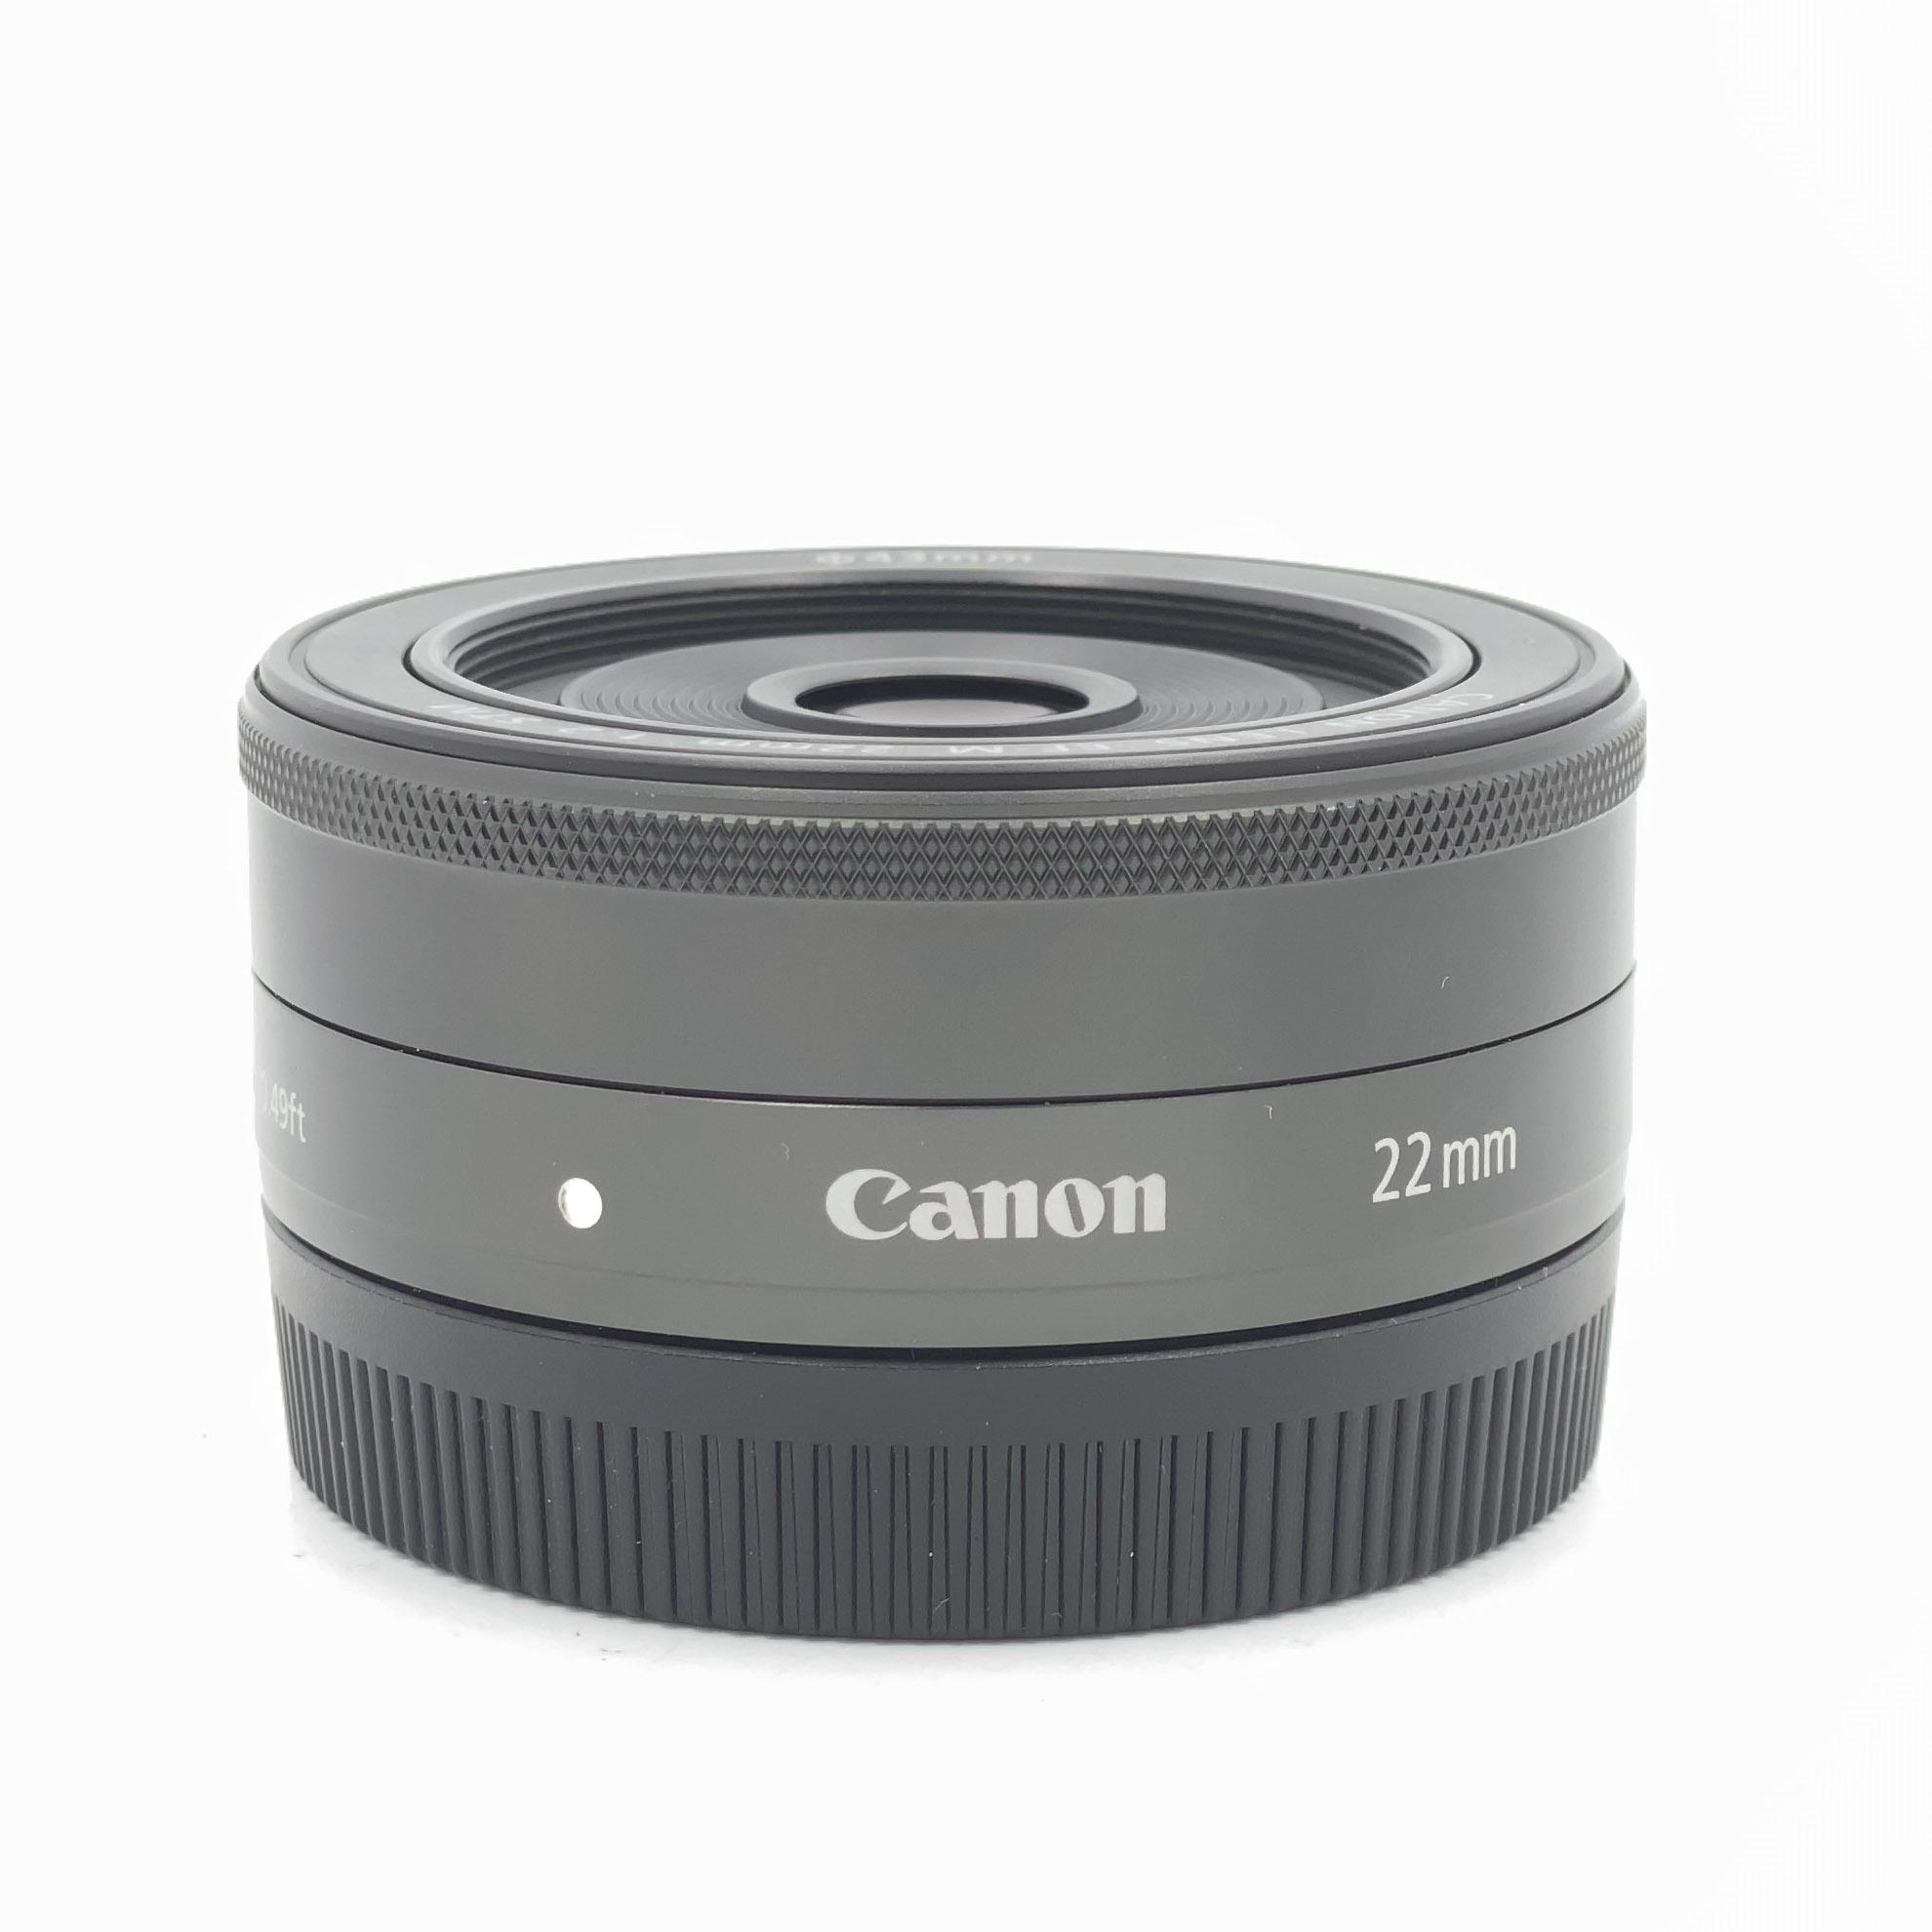 Used Canon 22mm F2 EF-M STM Prime Lens